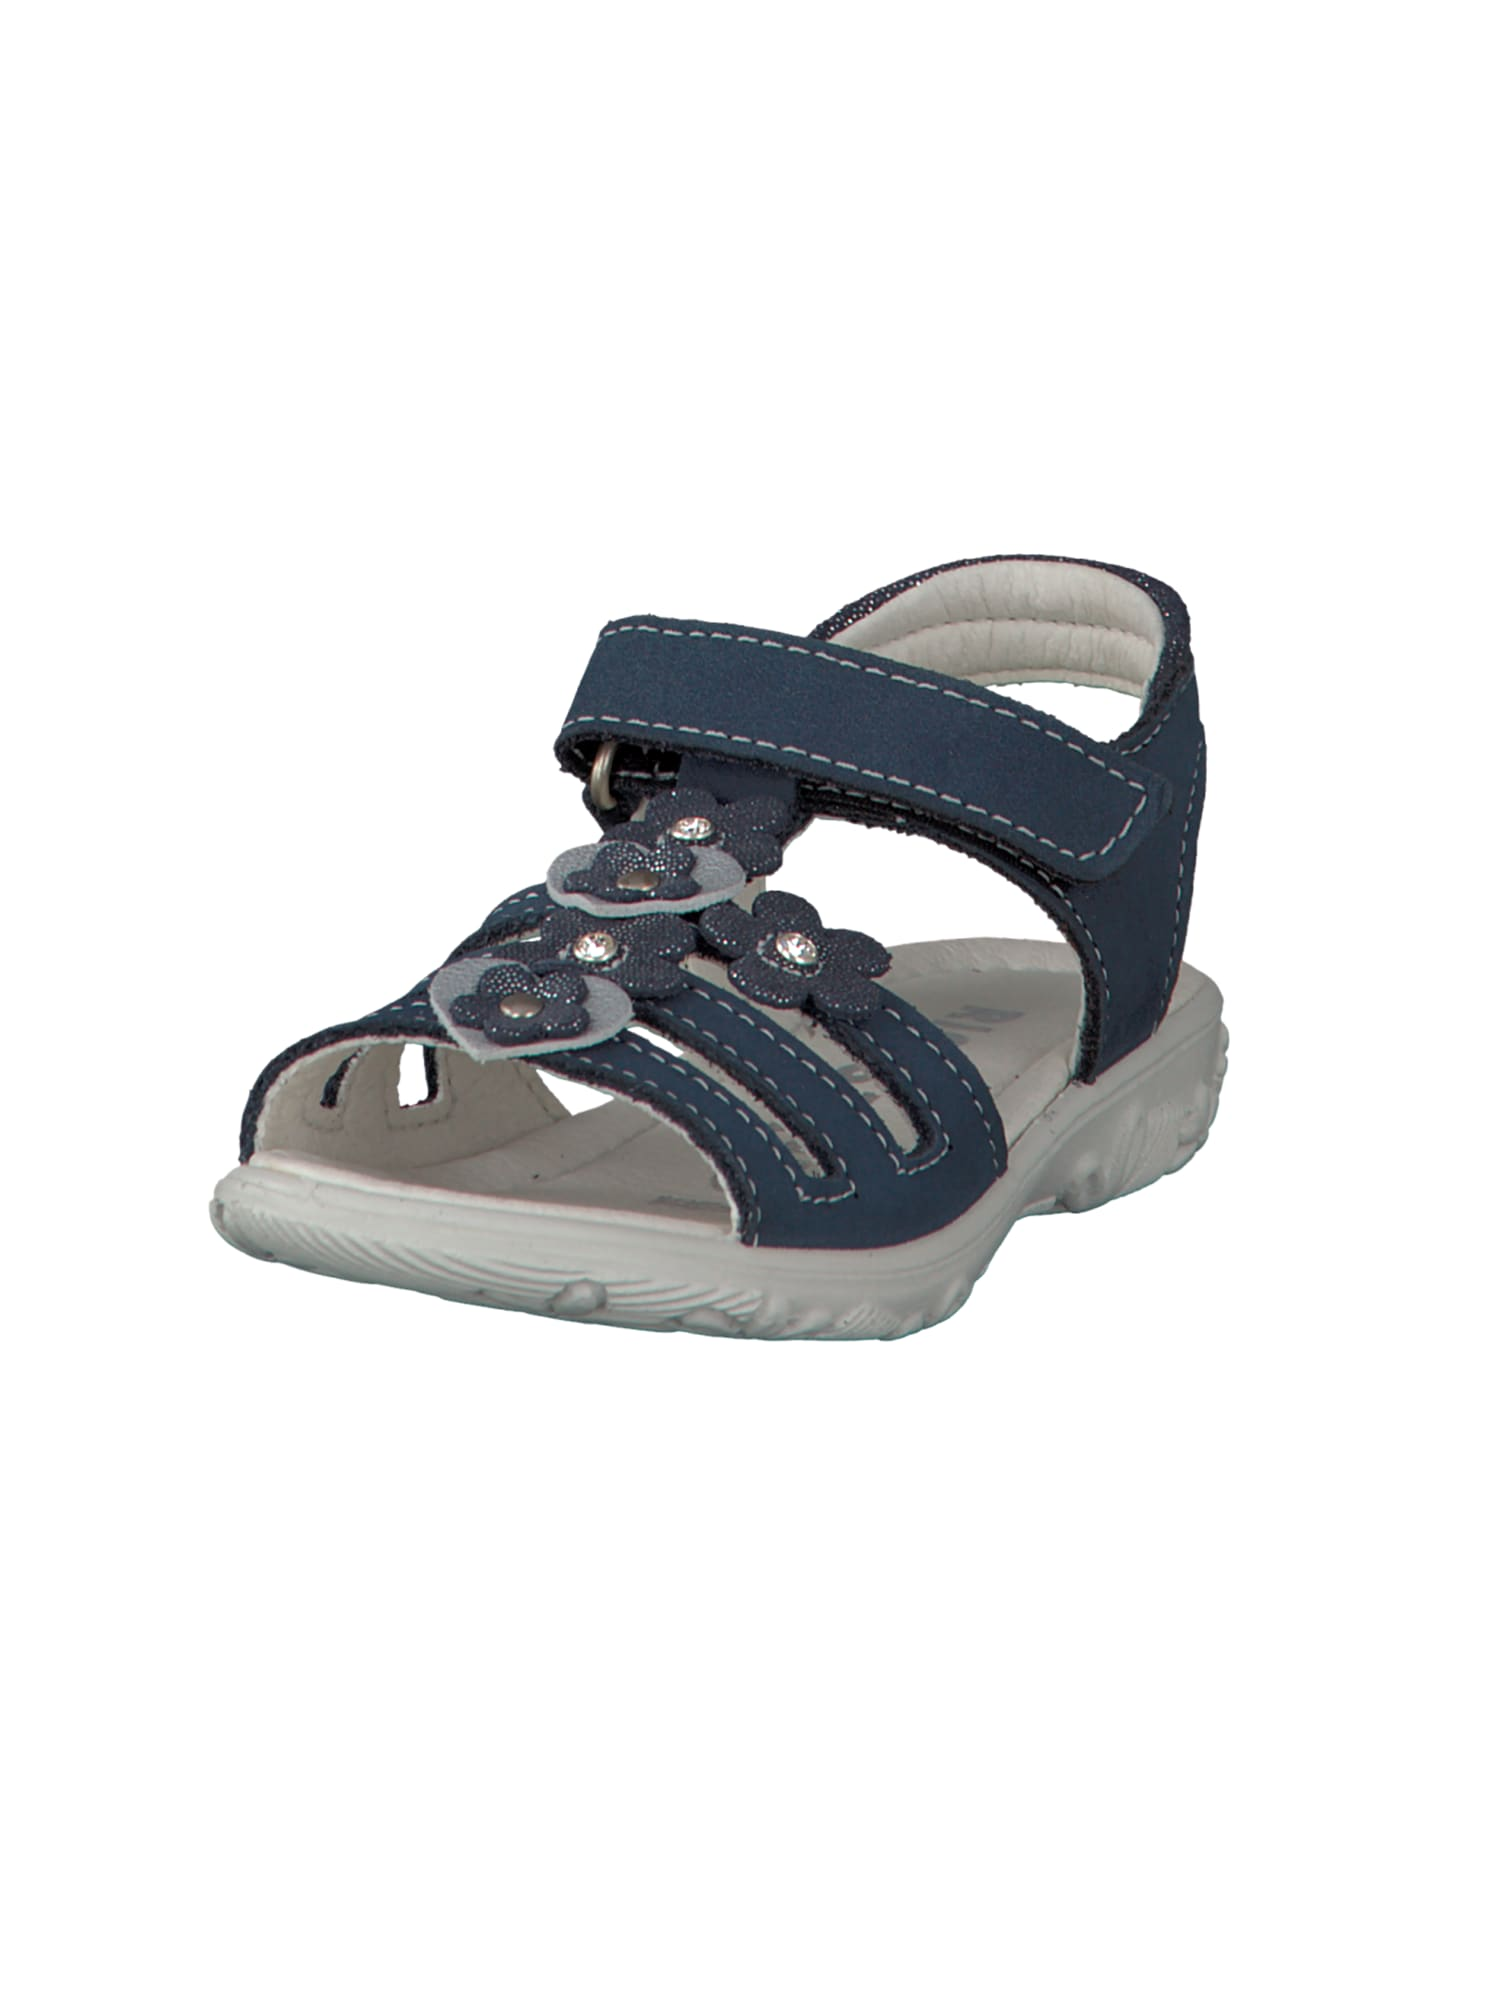 Sandály CHICA modrá RICOSTA